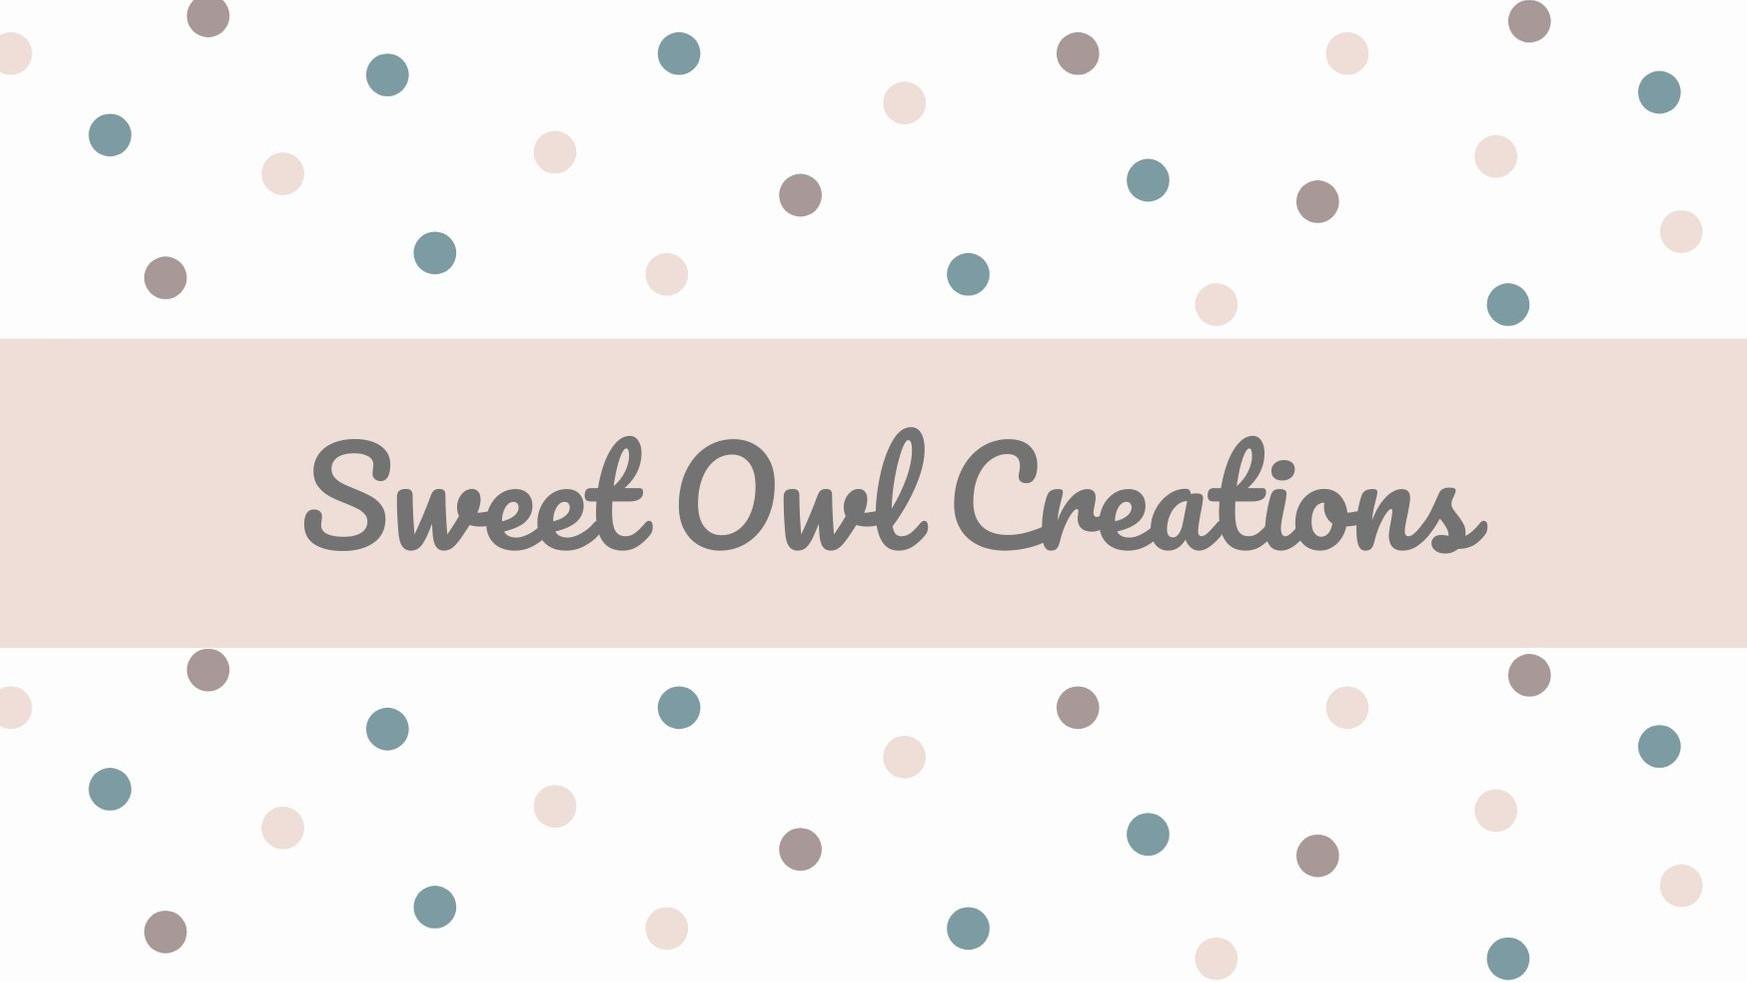 Sweet Owl Creations